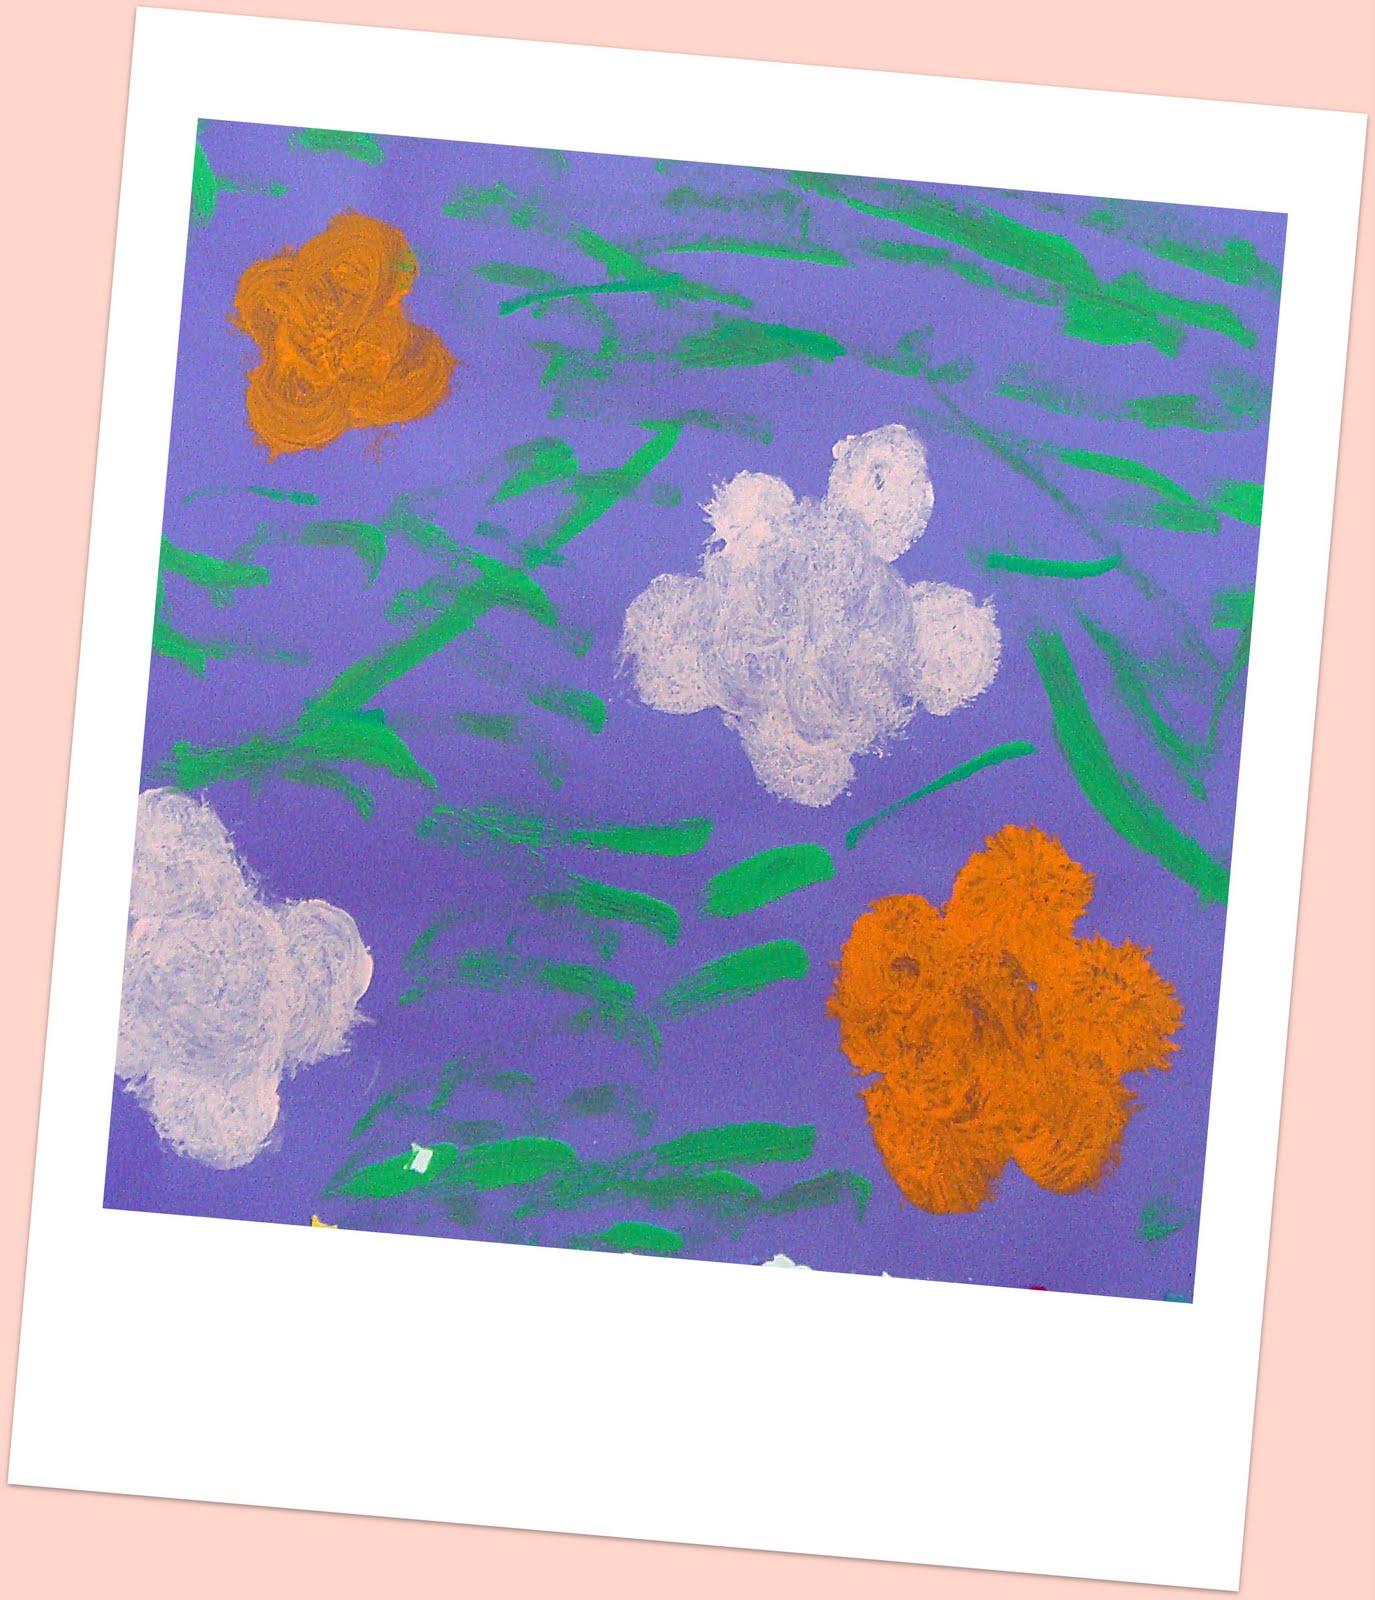 Telas Flores Pinturas Fraldas Rupestres Genuardis Portal